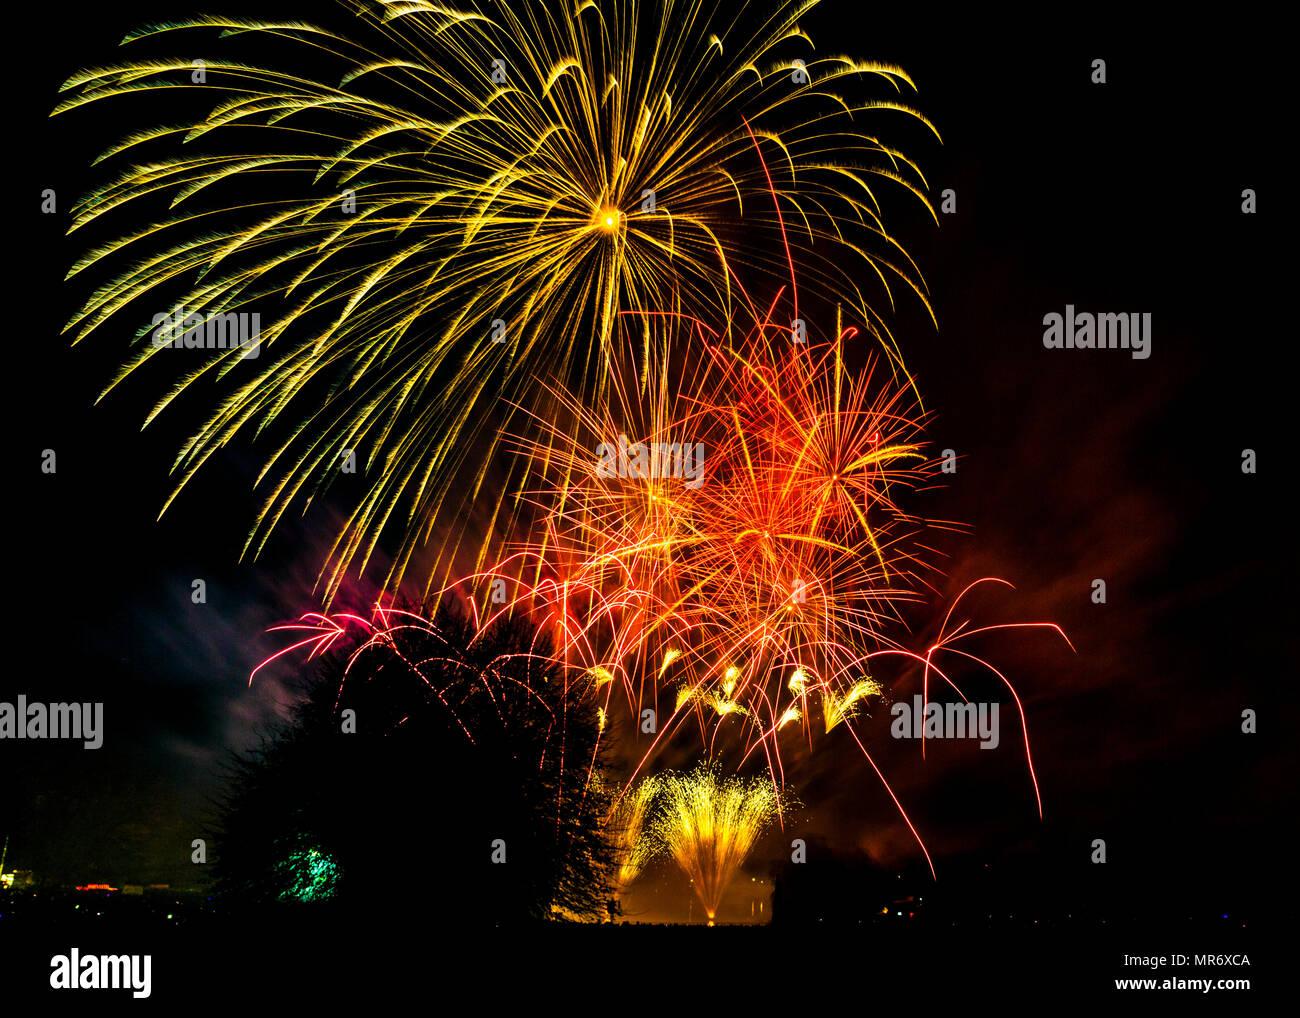 A firework display on November 5th celebration of the gunpowder plot of 1605 - Stock Image